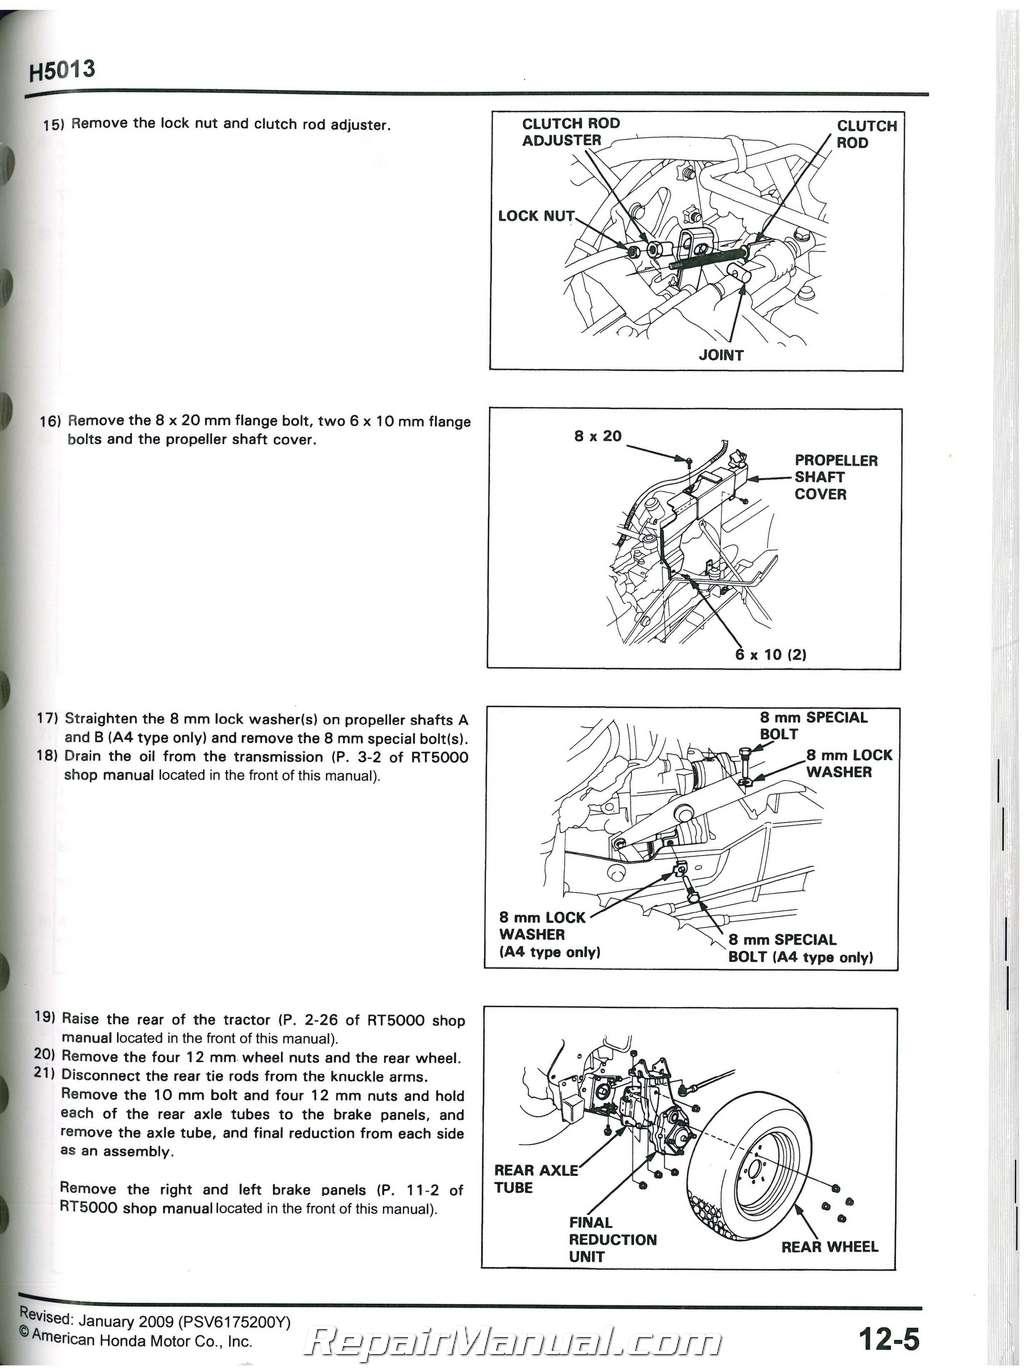 honda 9.9 babj shop manual